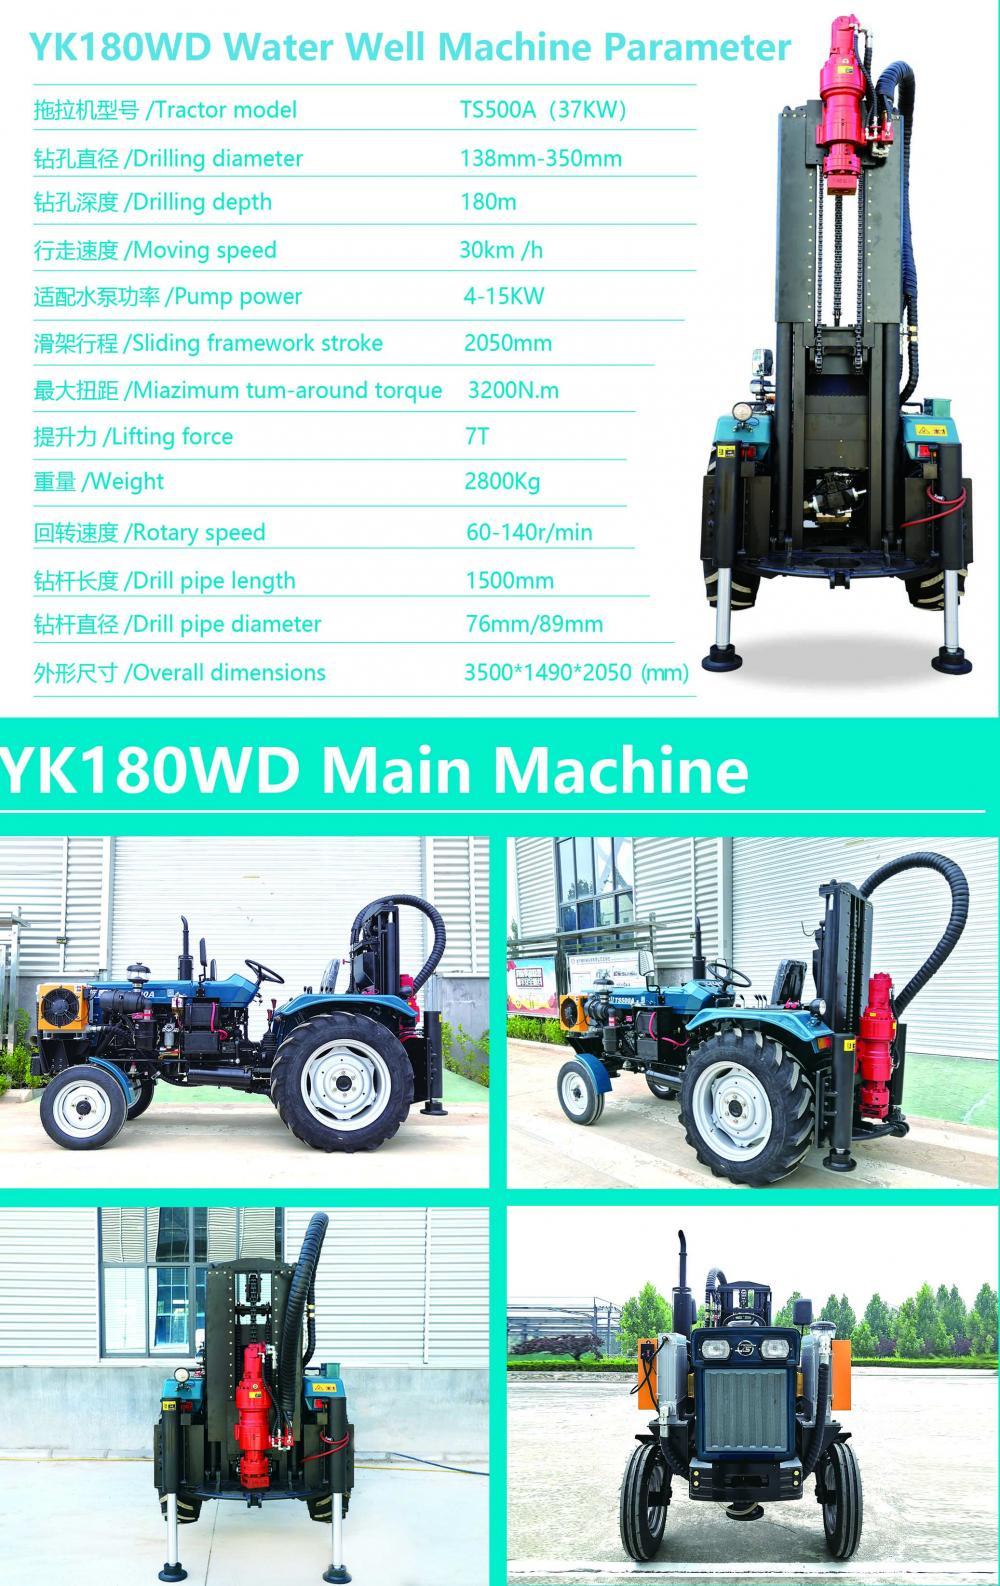 Yk180wd 180m Tractor Water Well Drilling Machine Parameter Jpg